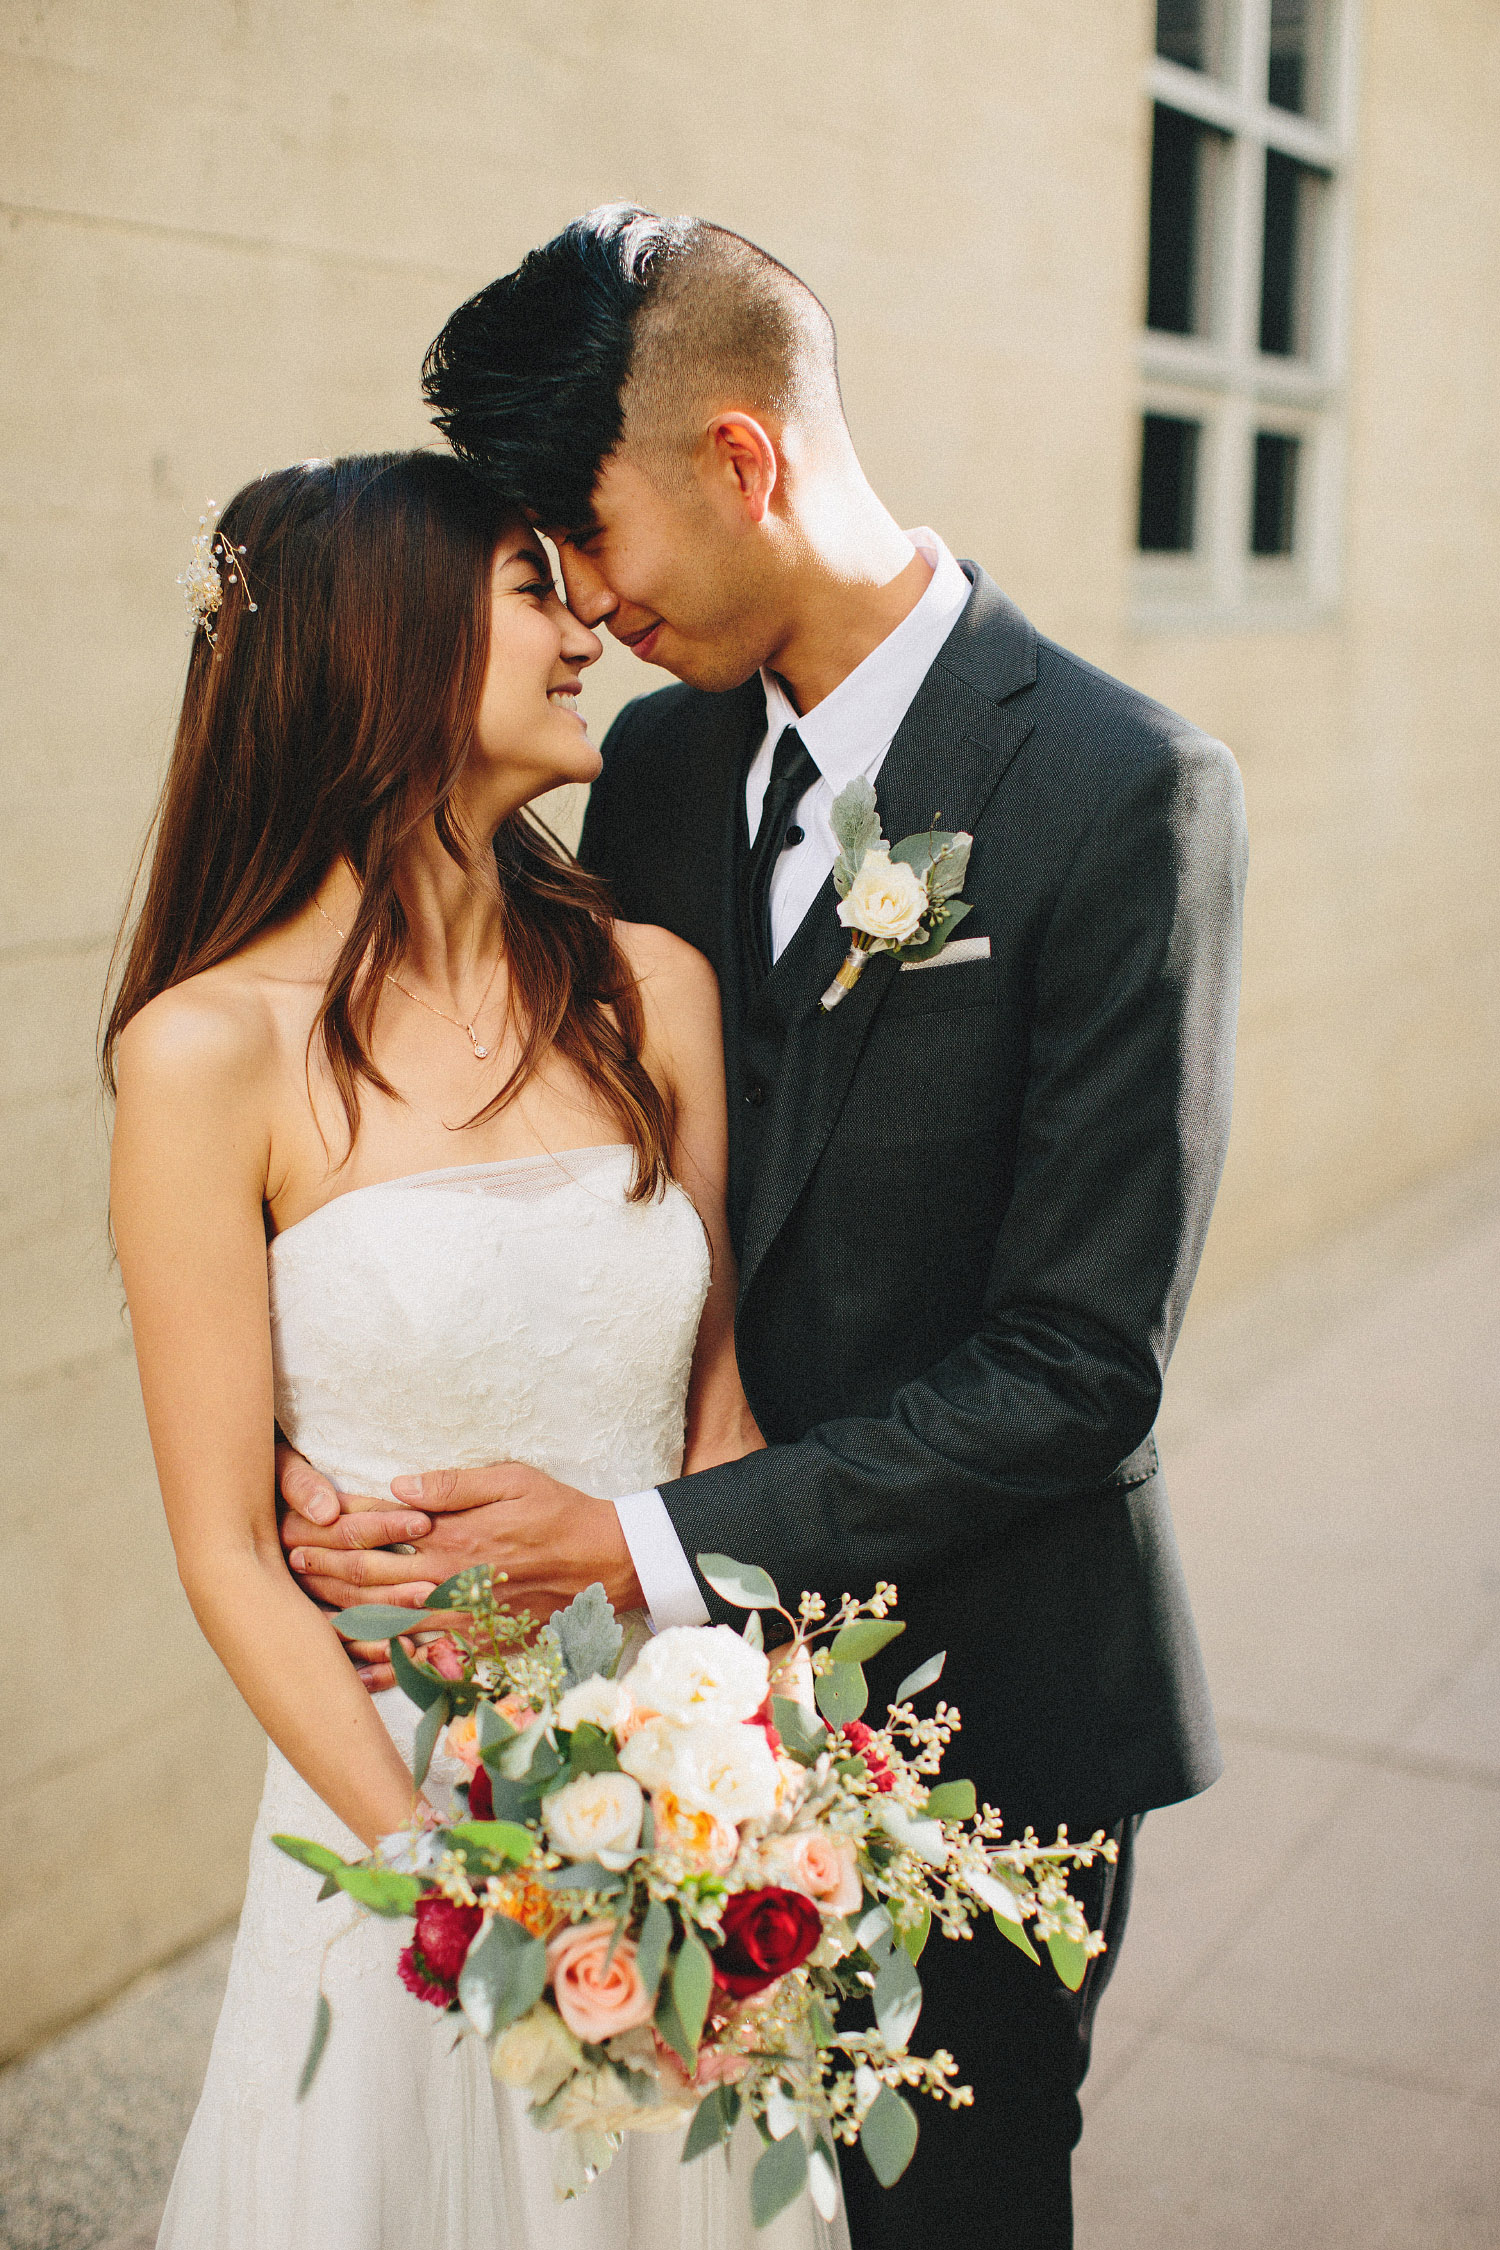 Loft_on_pine_wedding_13.jpg